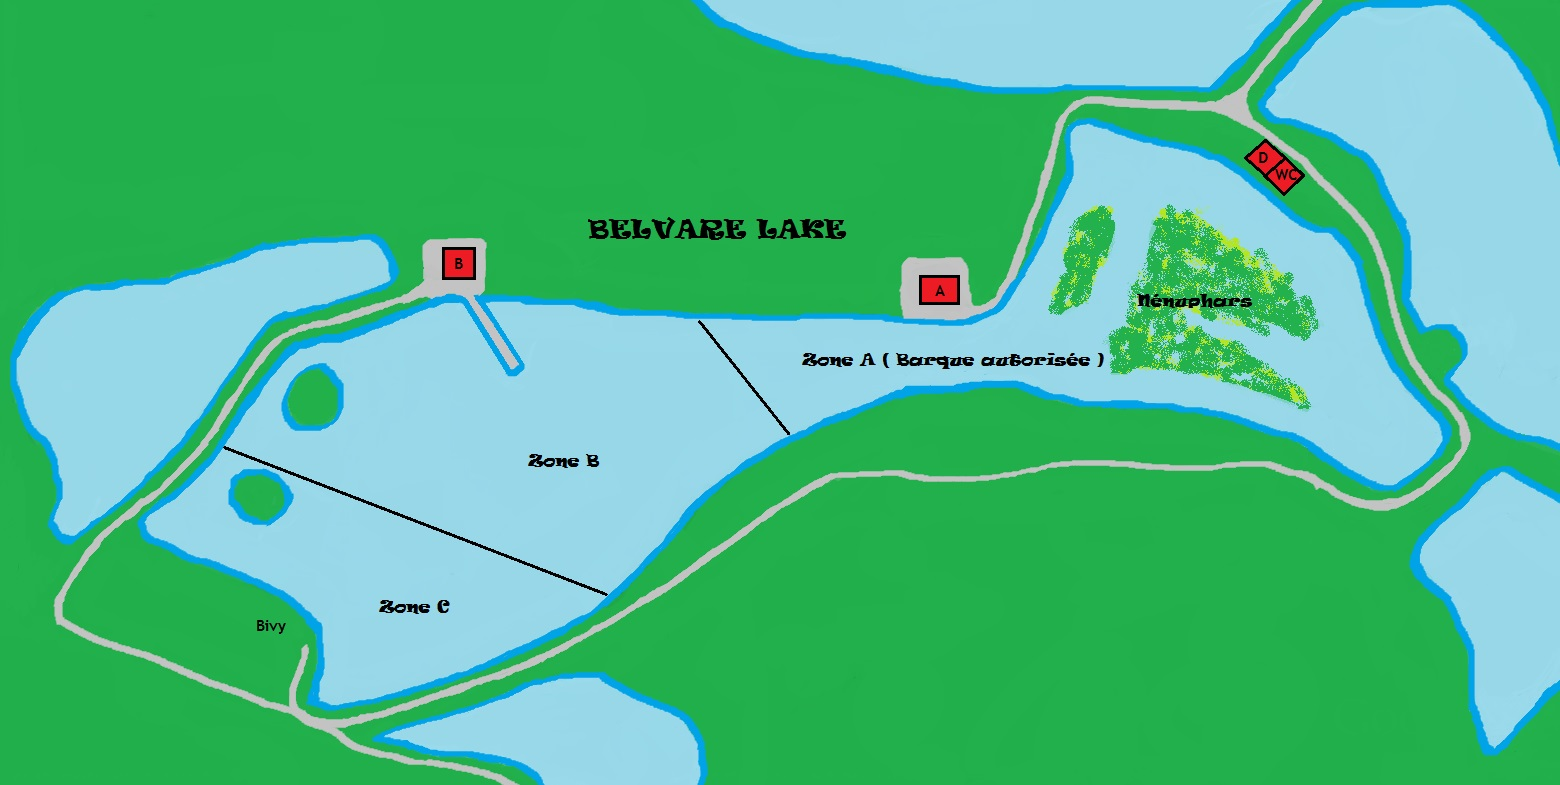 Belvare: 8p. Jachthuis + Zone A incl 1 visser met  4 hengels